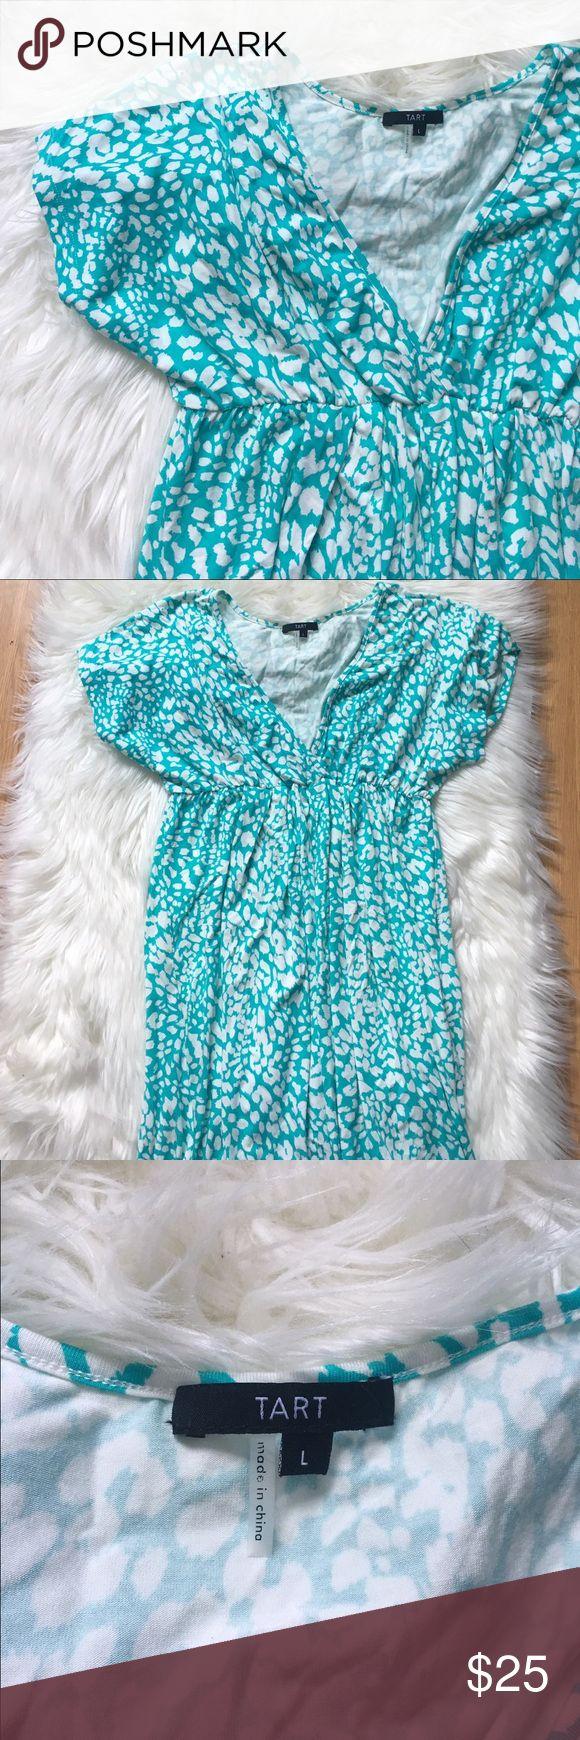 ASOS Teal Cheetah Print Dress Brand new condition! No flaws at all. NO TRADES PLEASE ASOS Dresses Midi